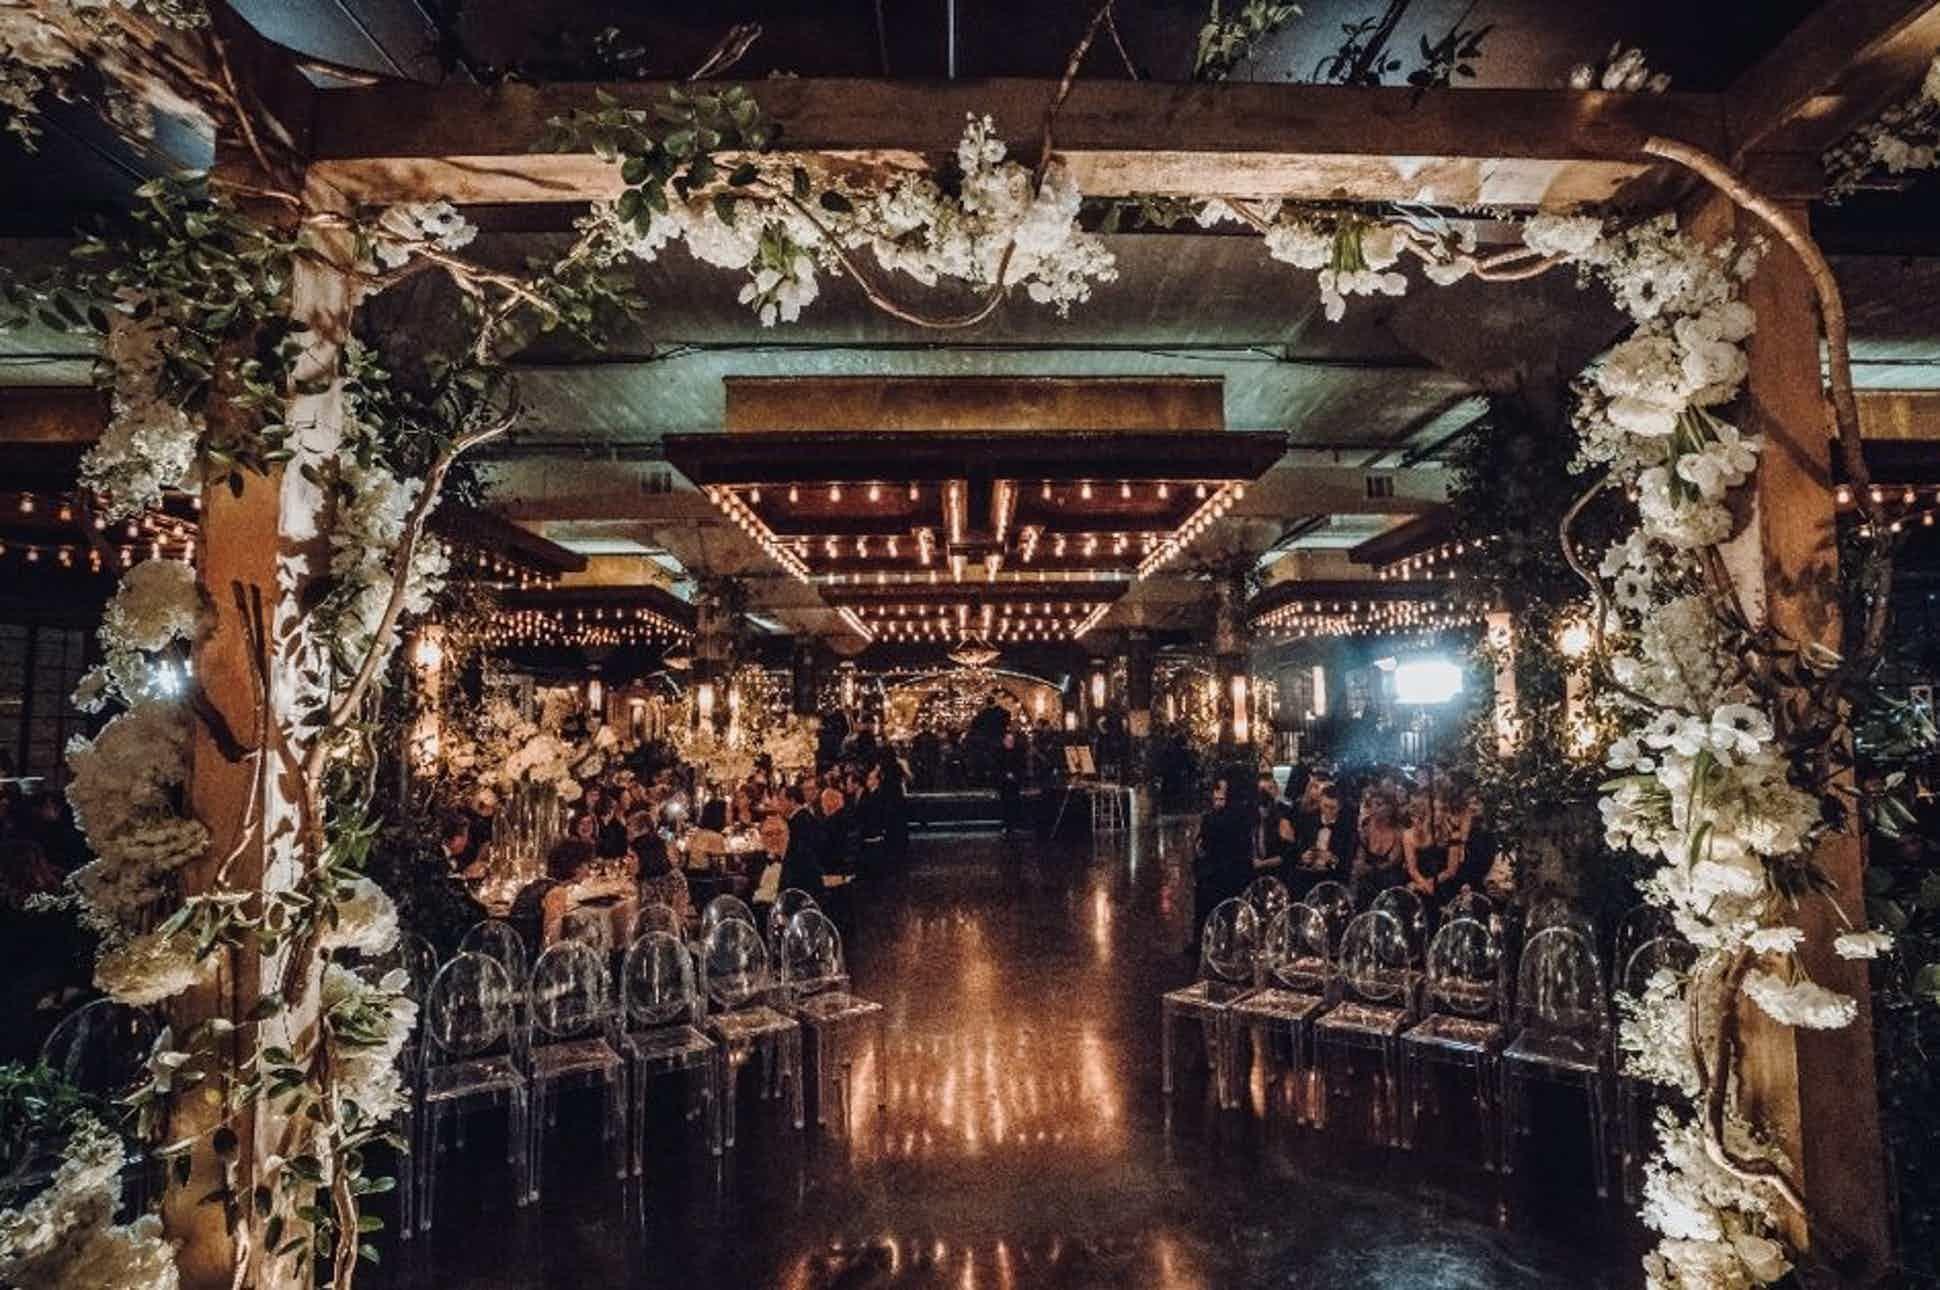 The Astorian Weddings Texas Wedding Venue Houston TX 77007 ...